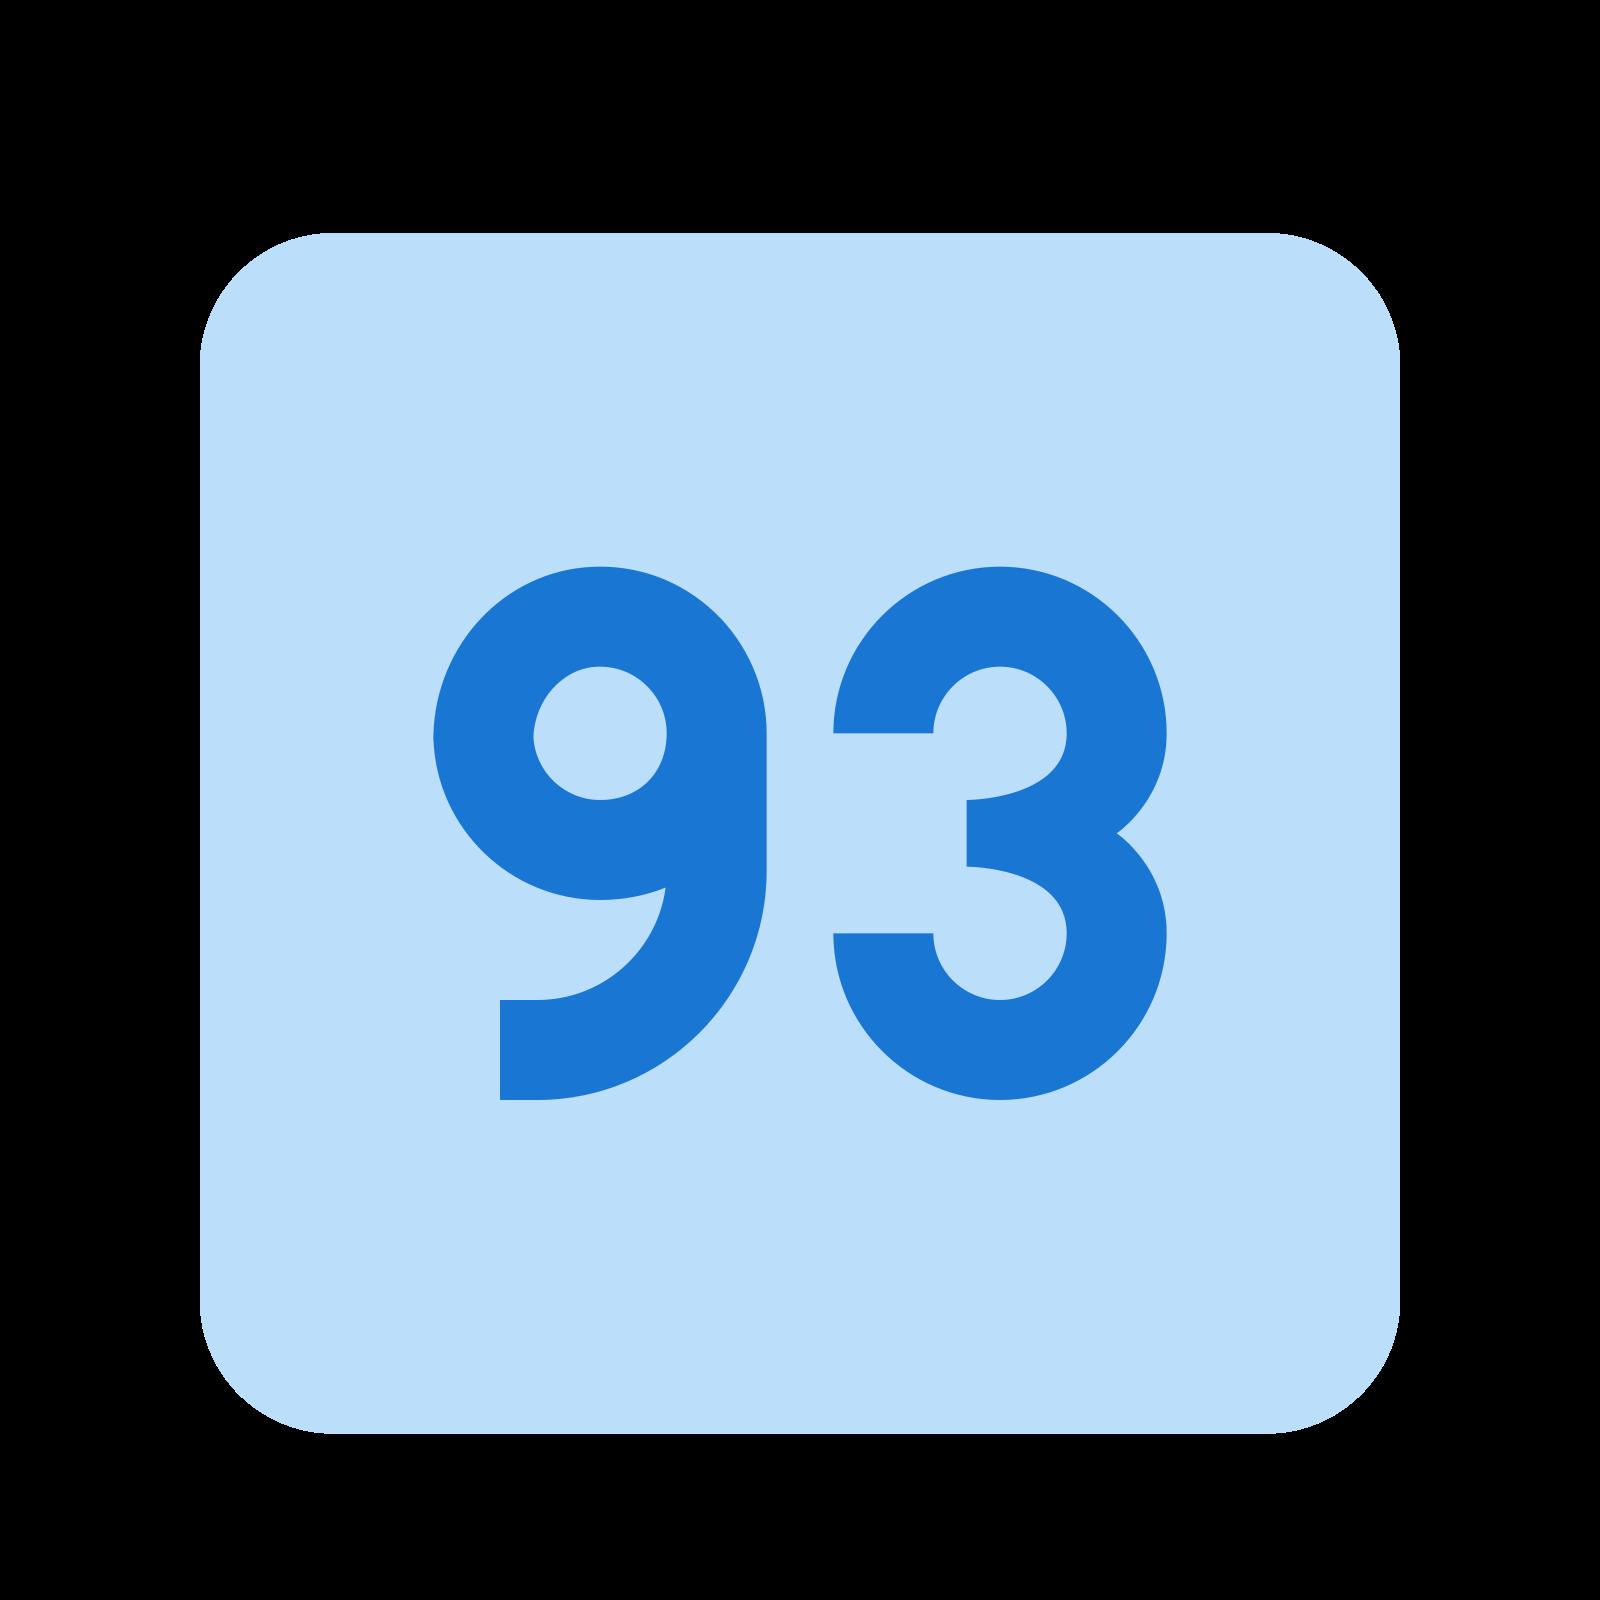 93 icon